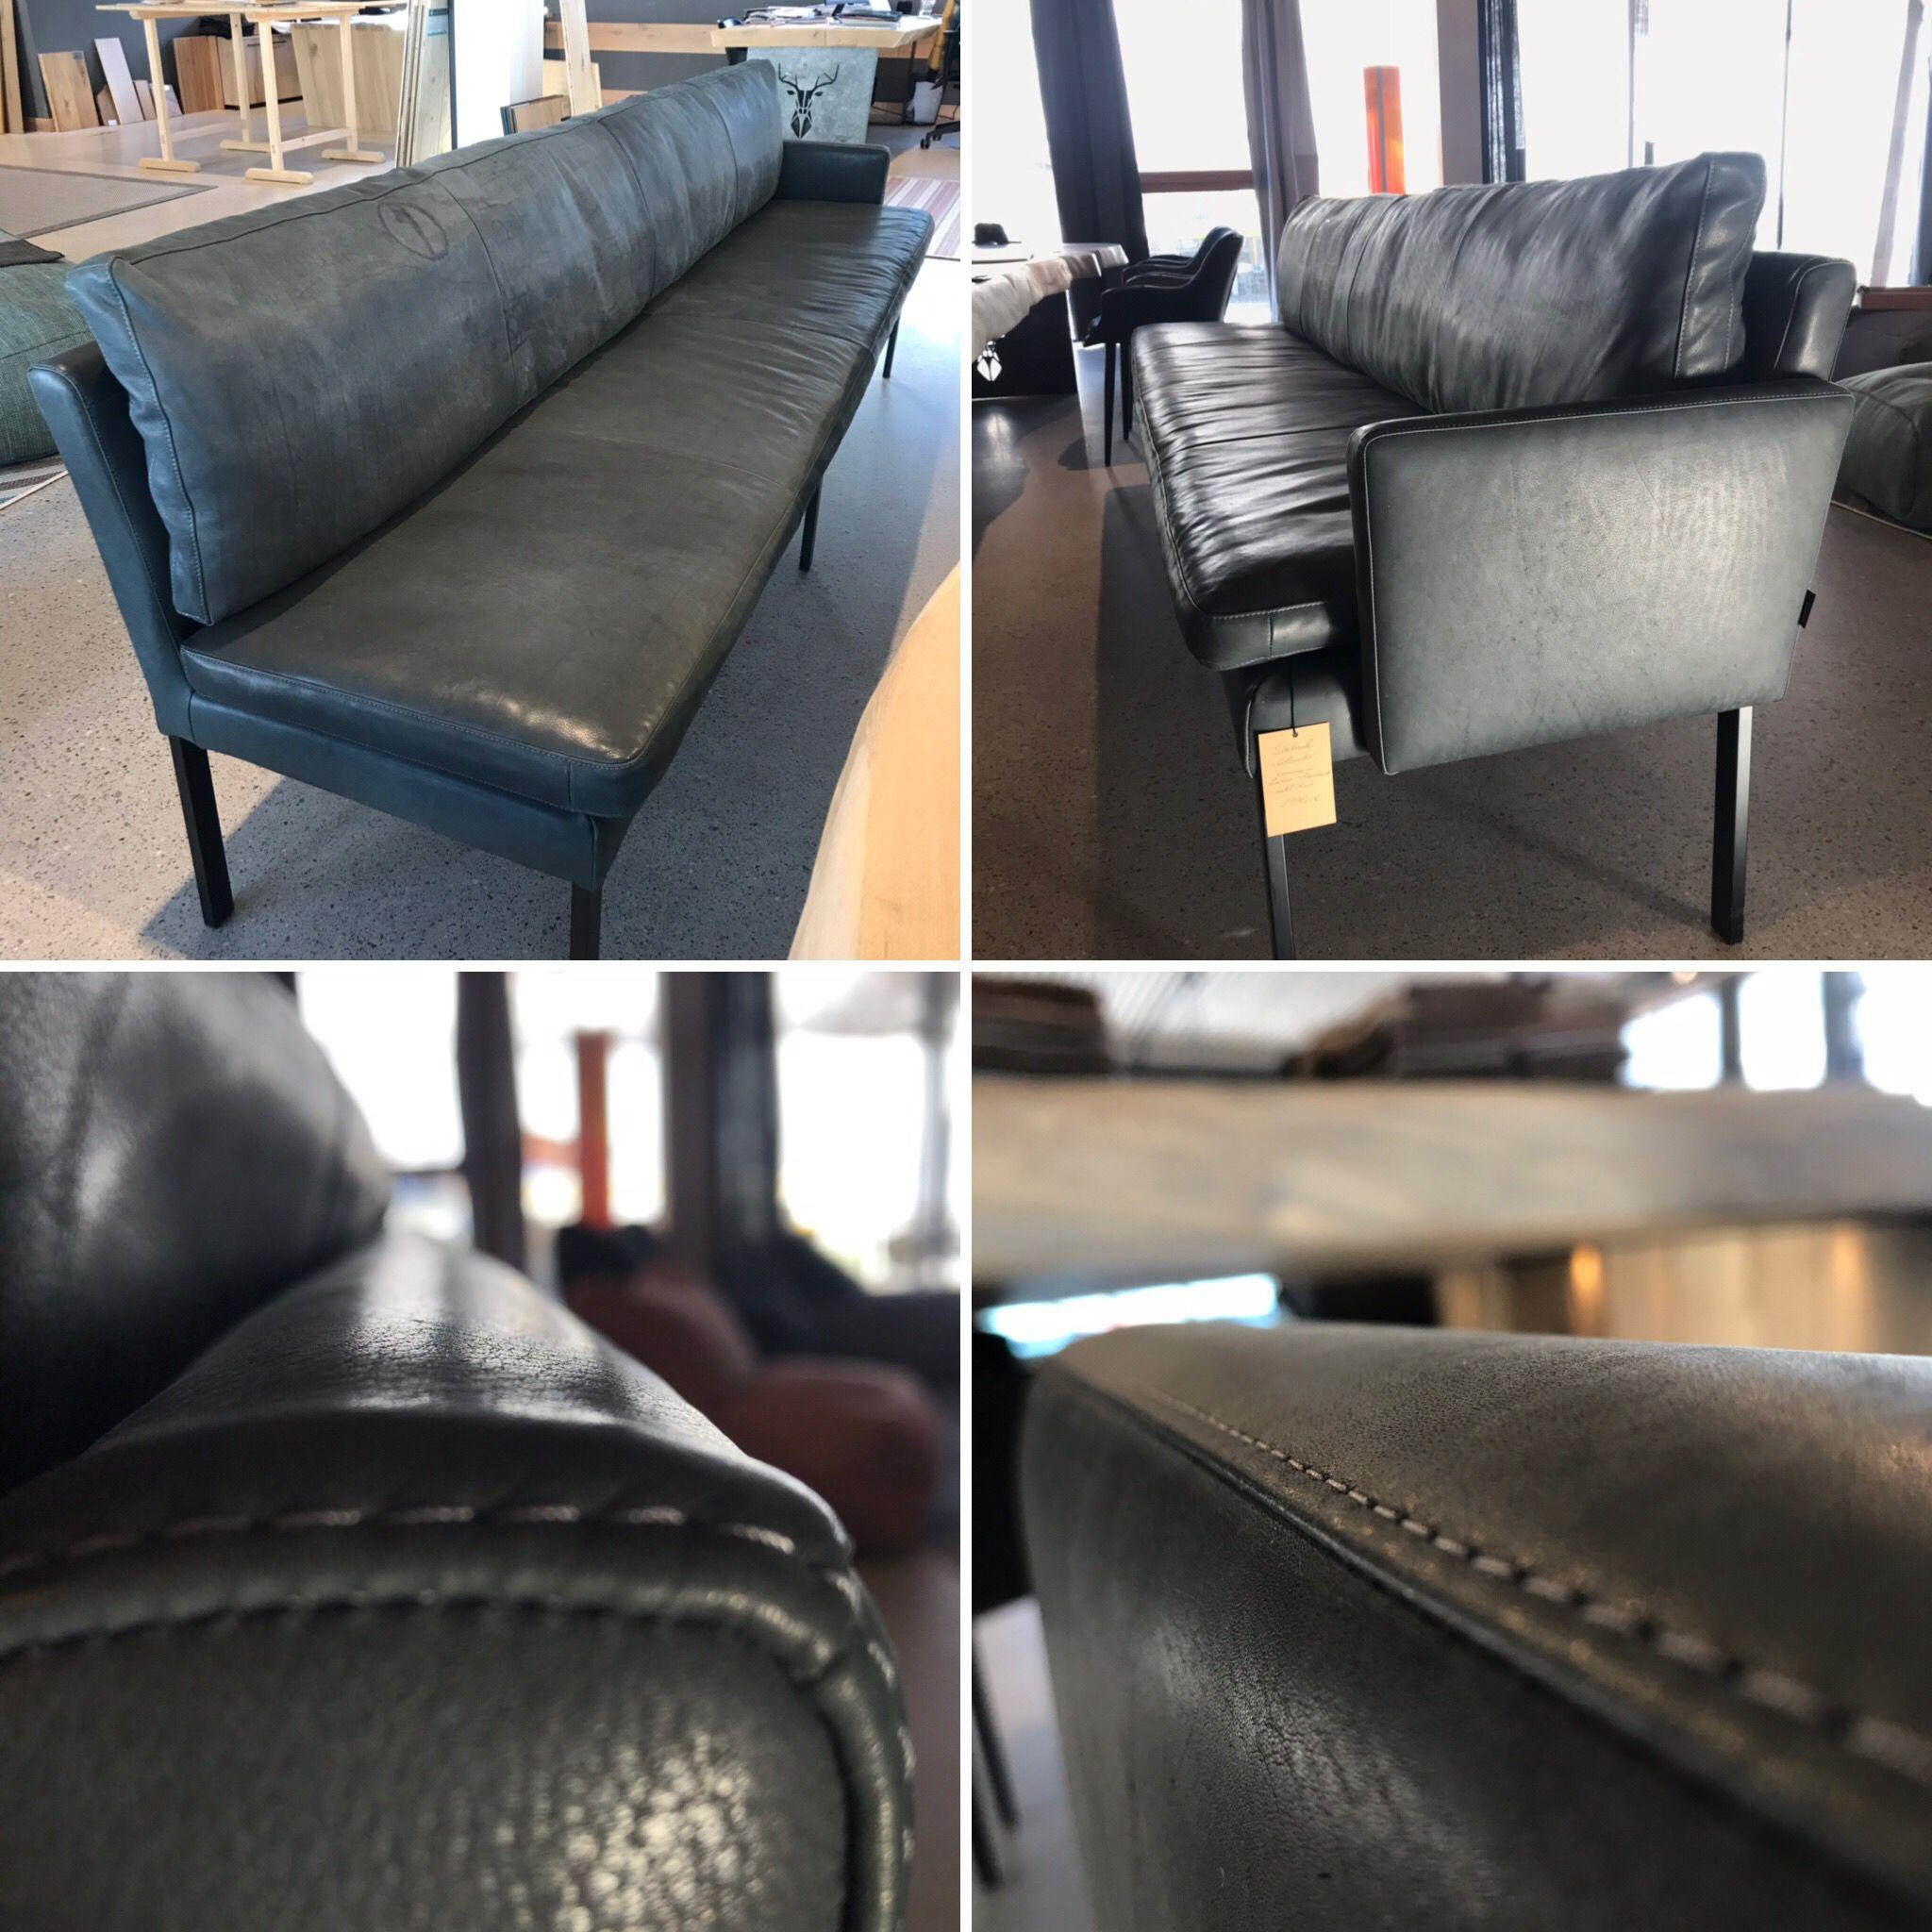 Sitzbank Von Tommy M Claudia In 2019 Sitzen Mobel Sitzbank